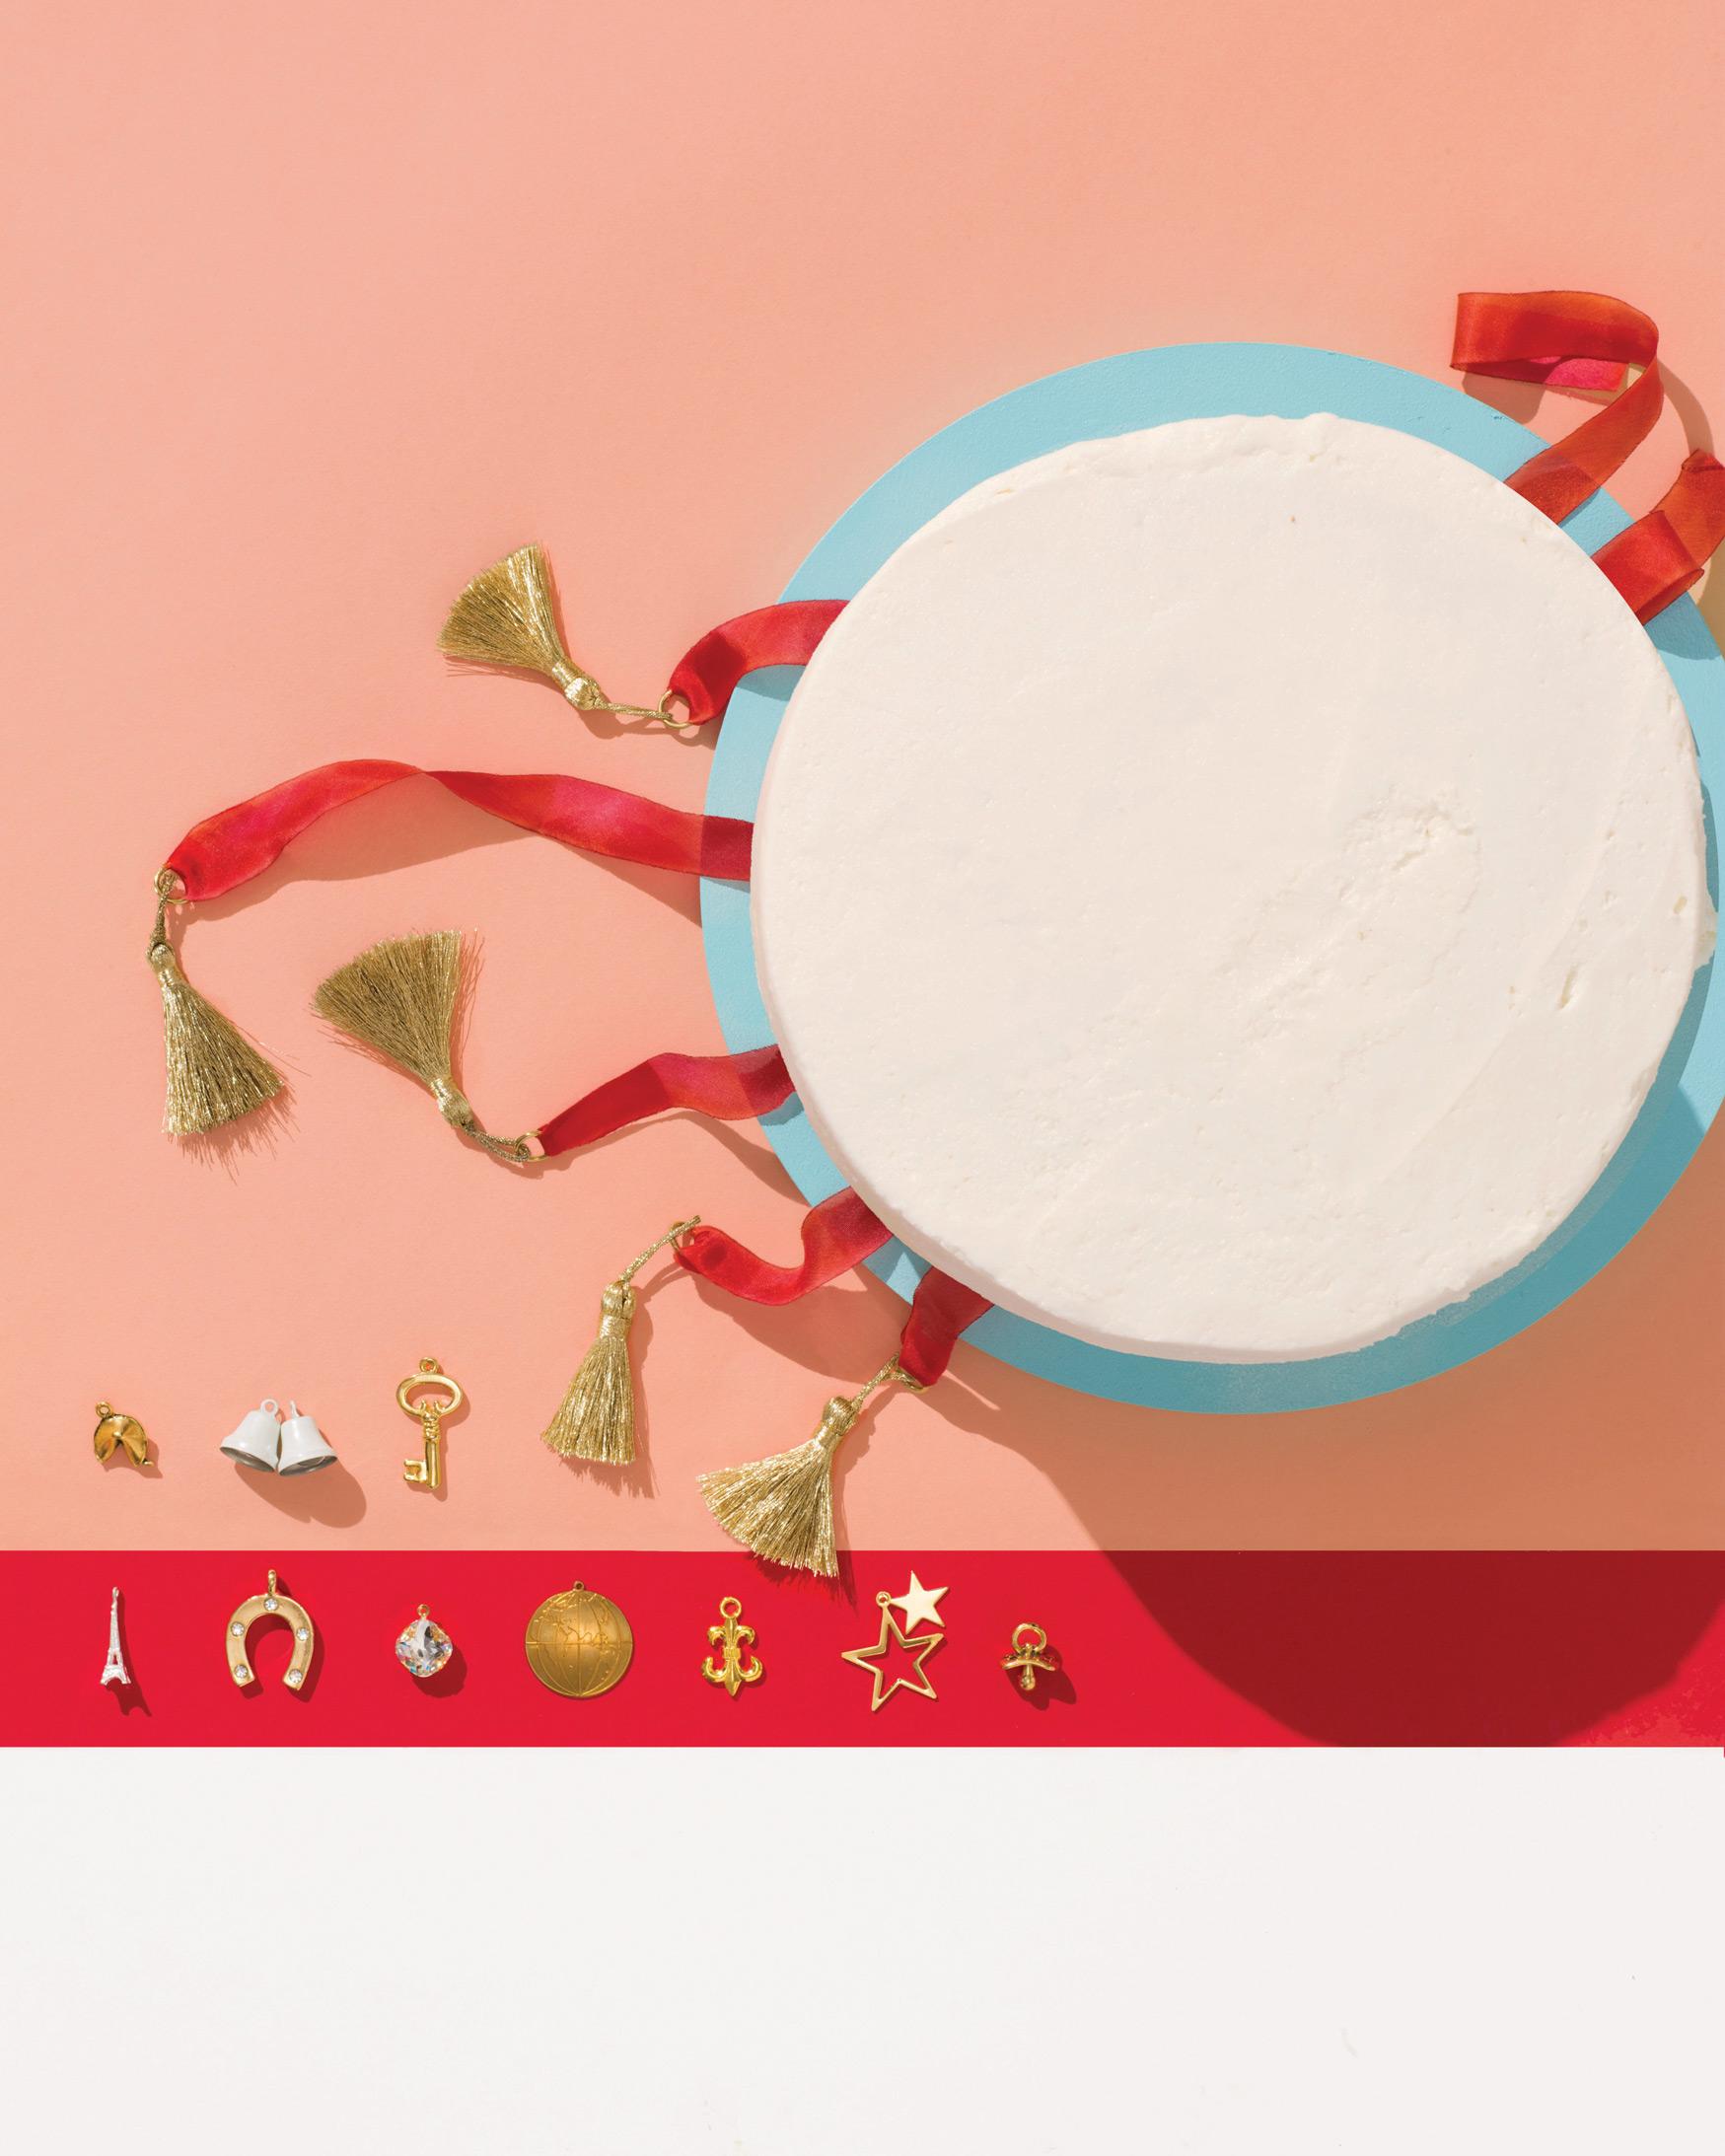 lucky-wedding-ideas-charms-with-cake-tassels-322-d112929.jpg